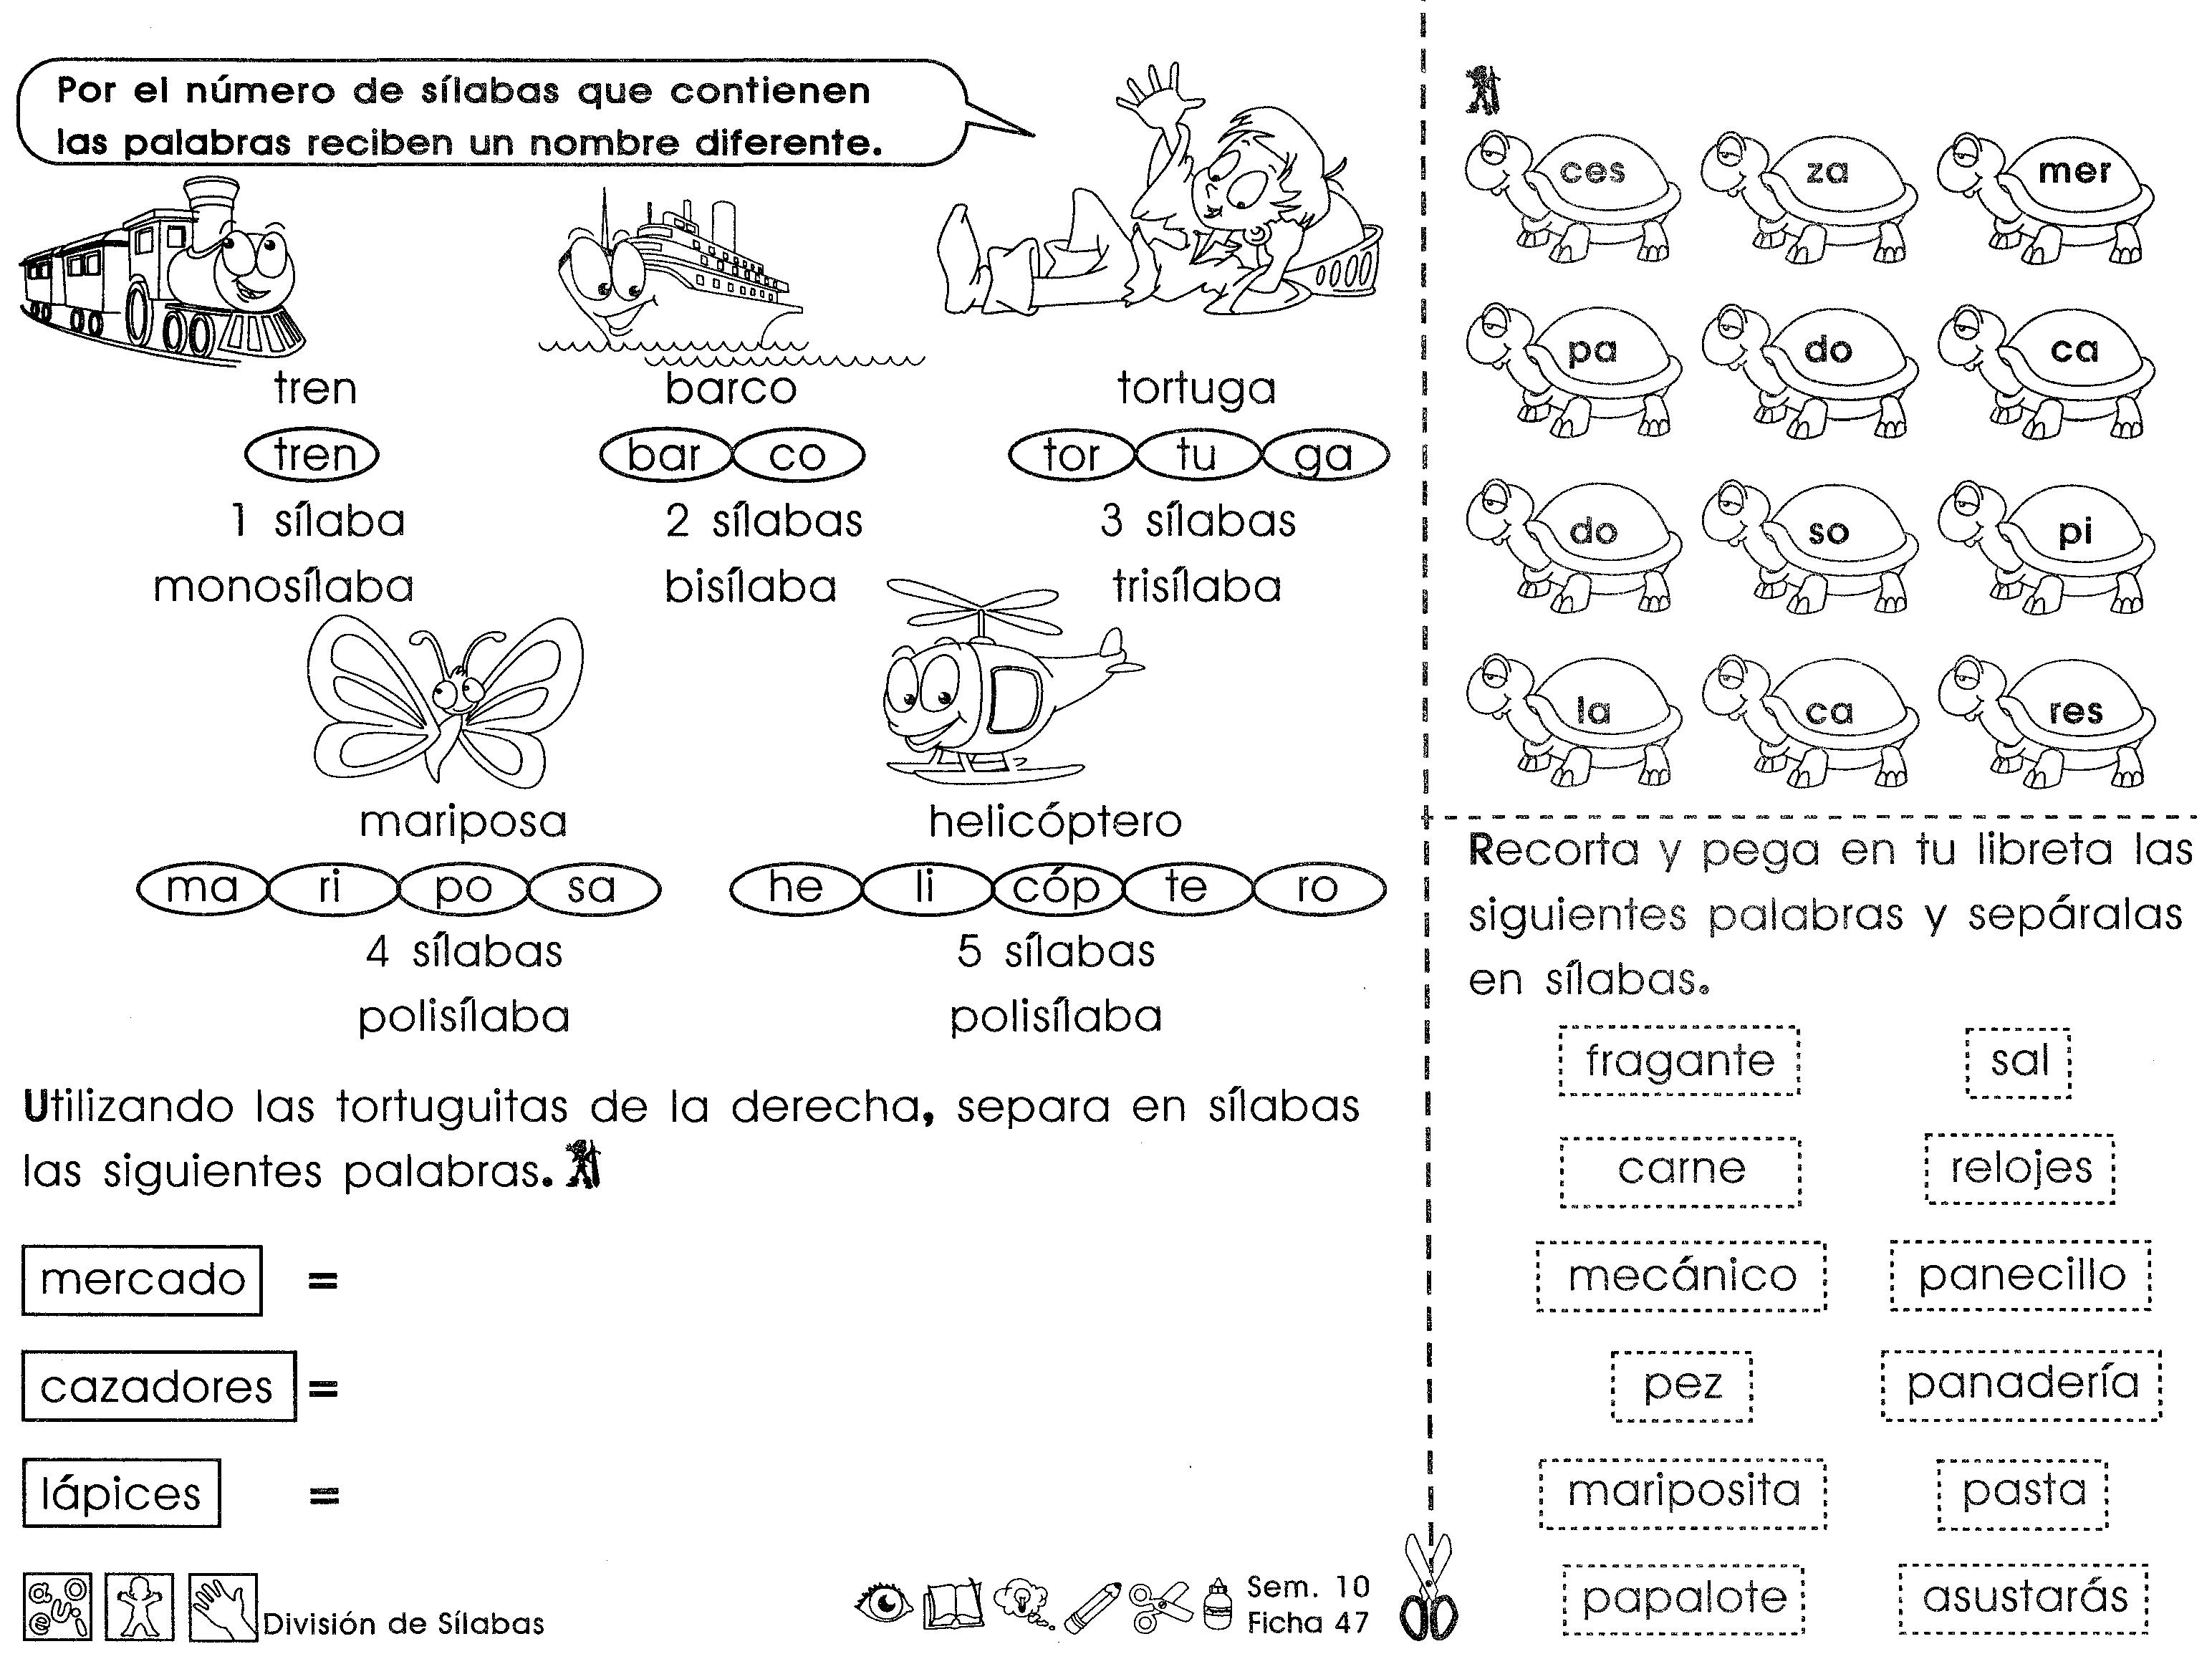 División de sílabas: 3er grado - Material de Aprendizaje   Division de  silabas, Silabas, División silabica